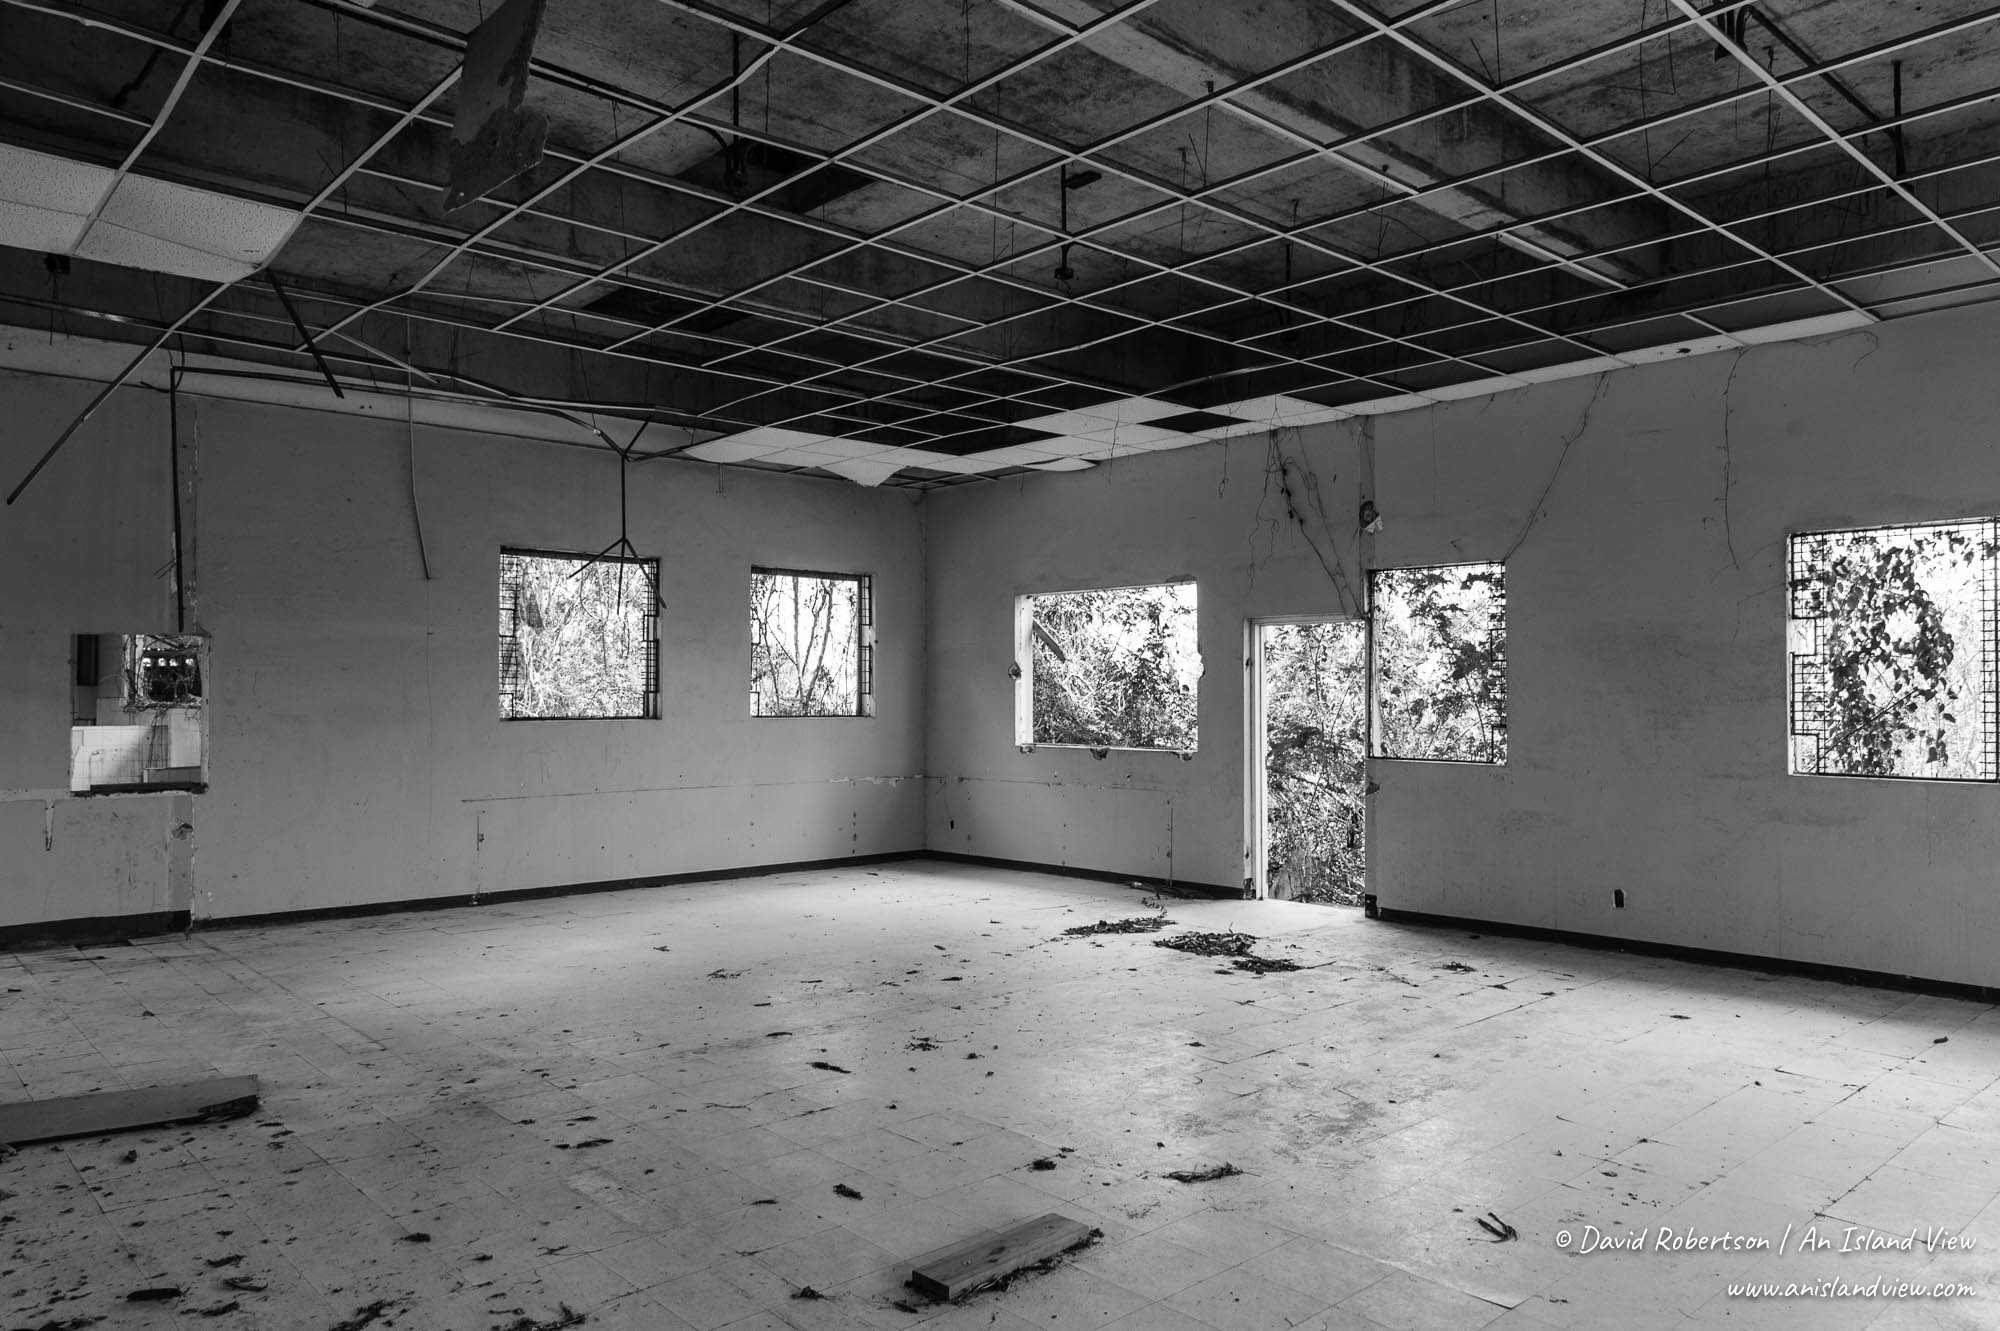 Abandoned navy base buildings.